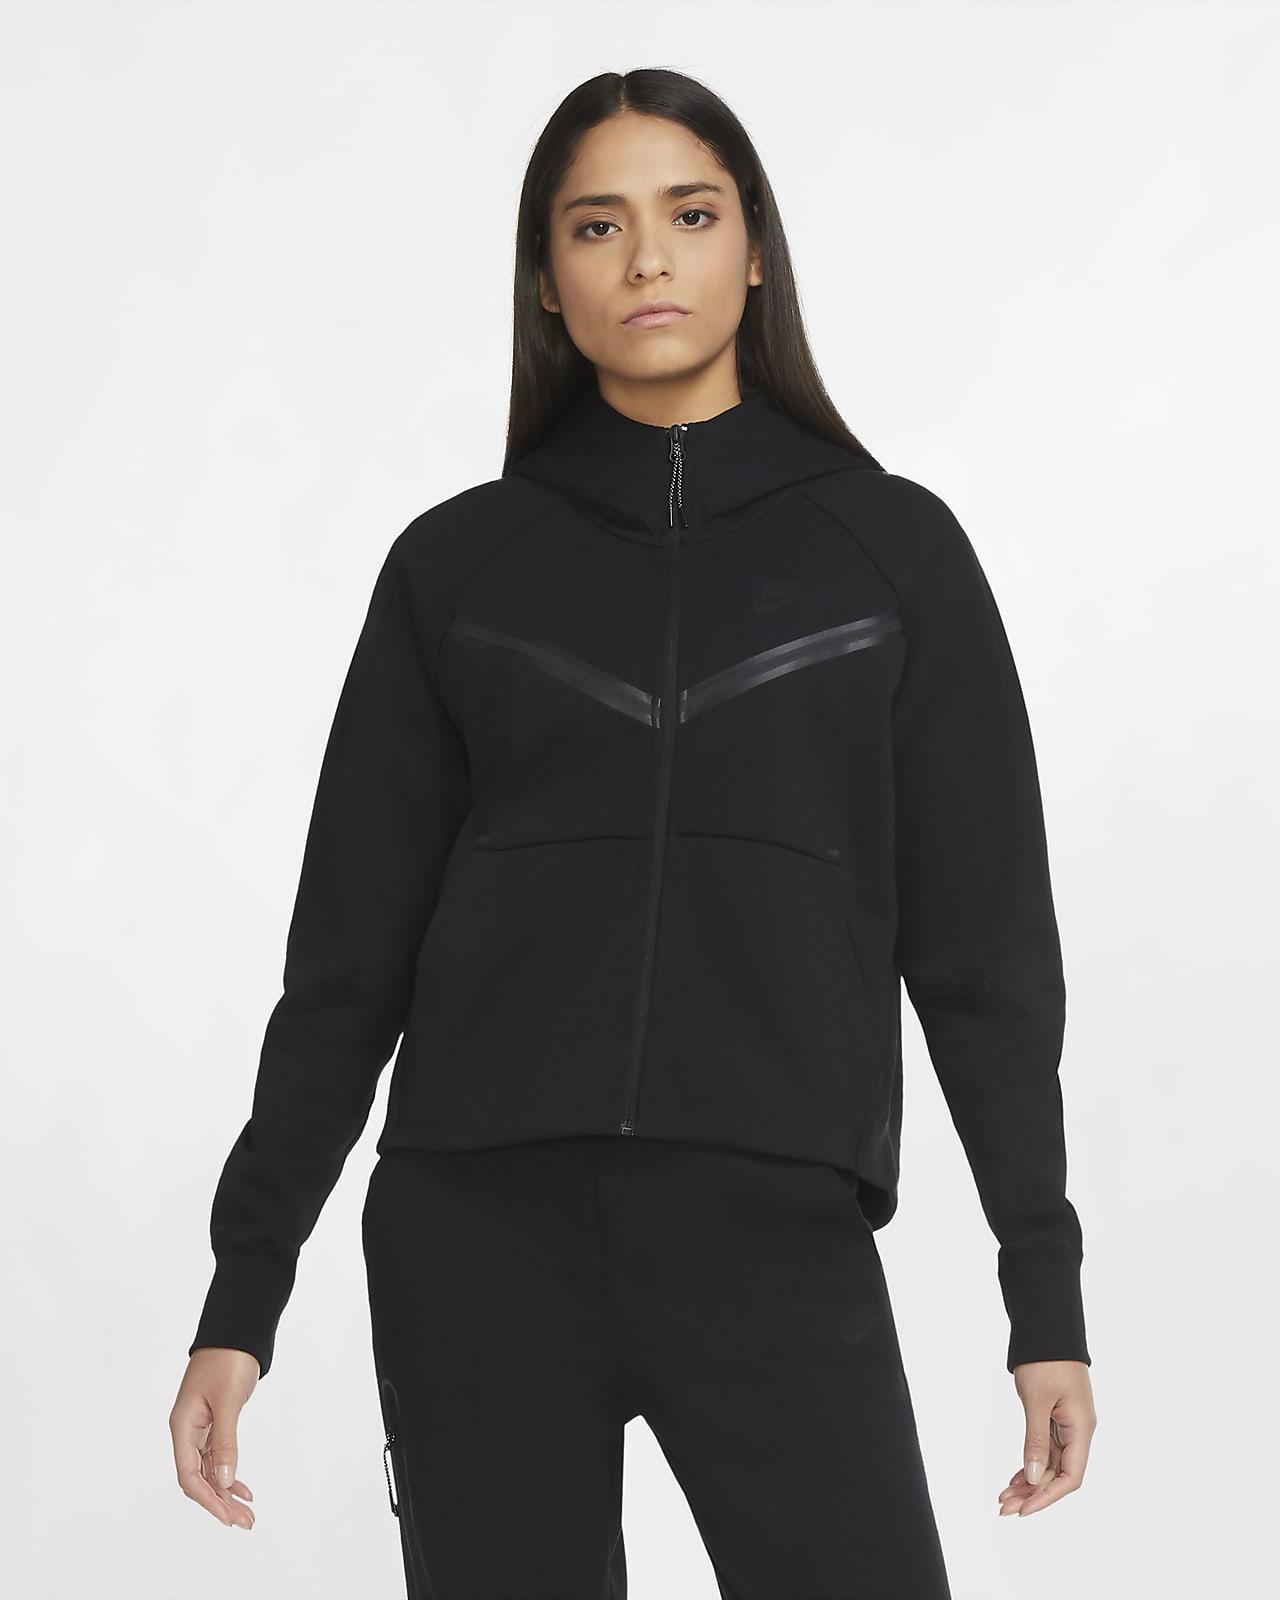 Nike Sportswear Tech Fleece Windrunner Hoodie met rits voor dames